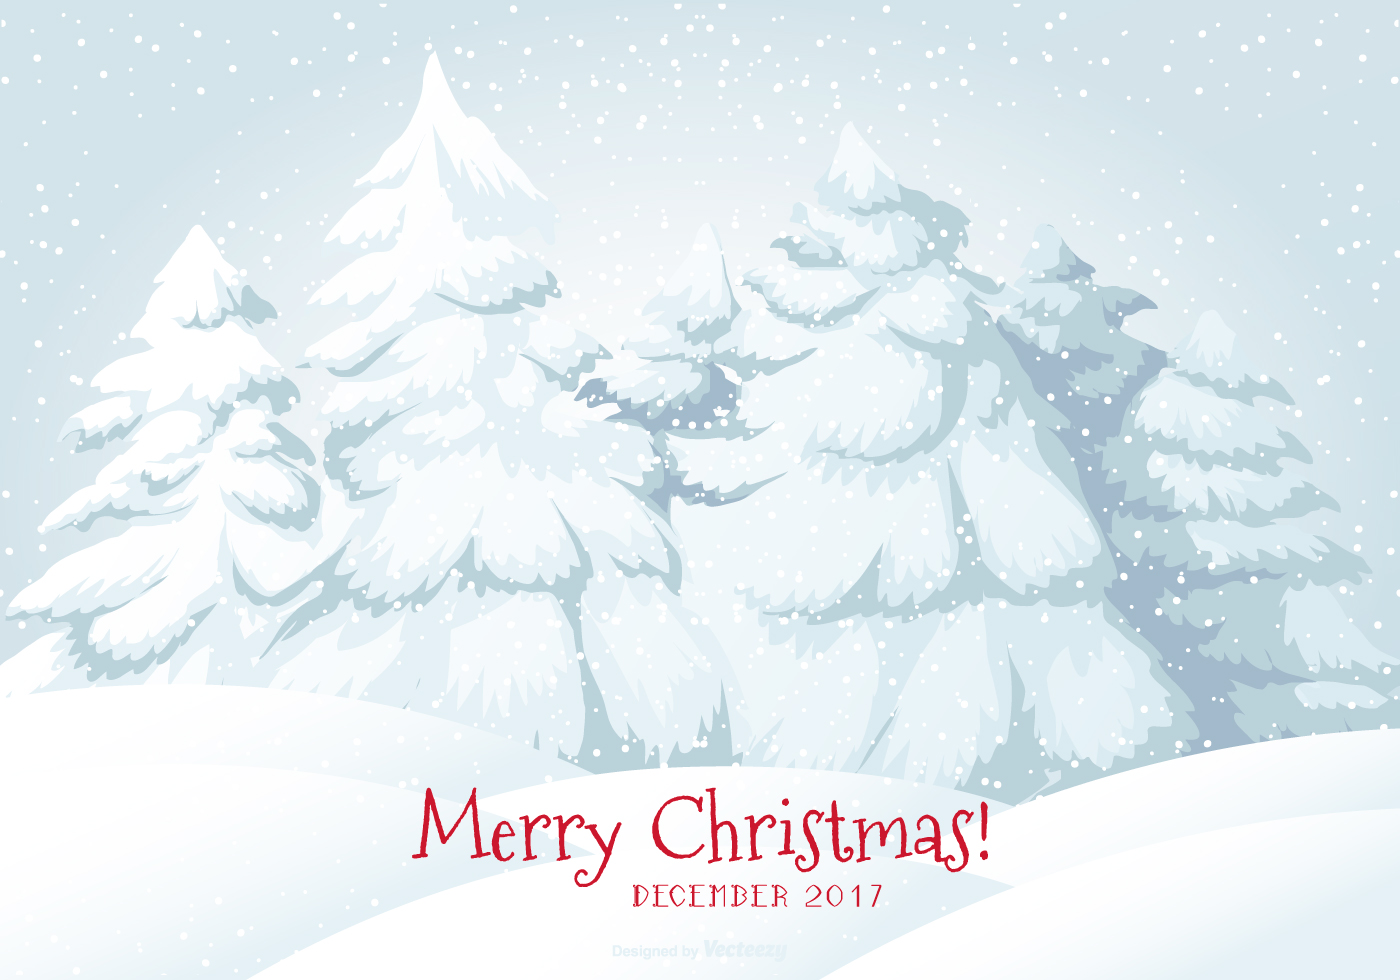 2017 Frohe Weihnachten Schnee Szene Illustration - Kostenlose Vektor ...